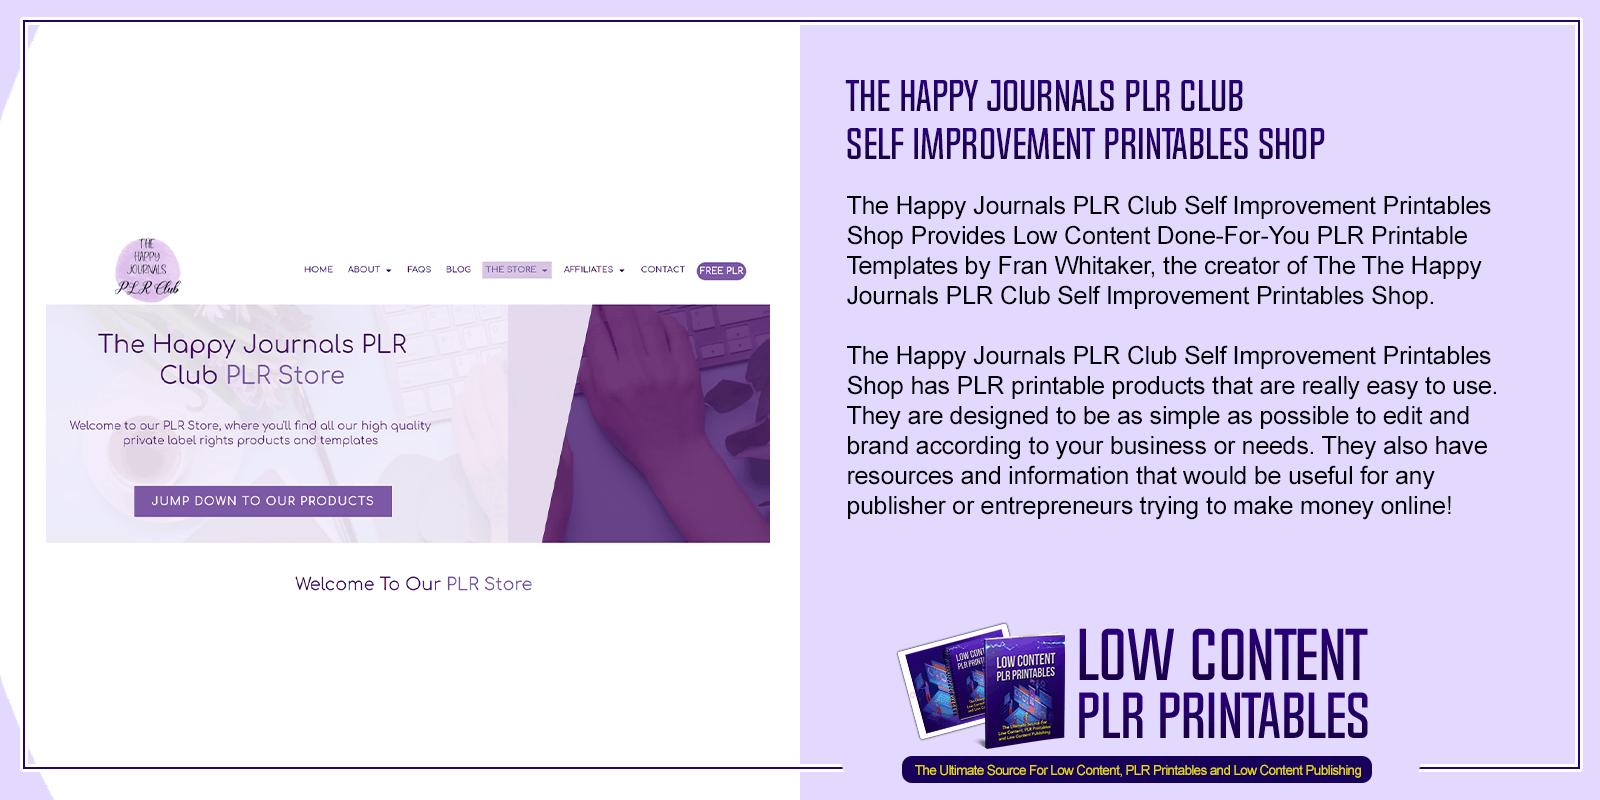 The Happy Journals PLR Club Self Improvement Printables Shop